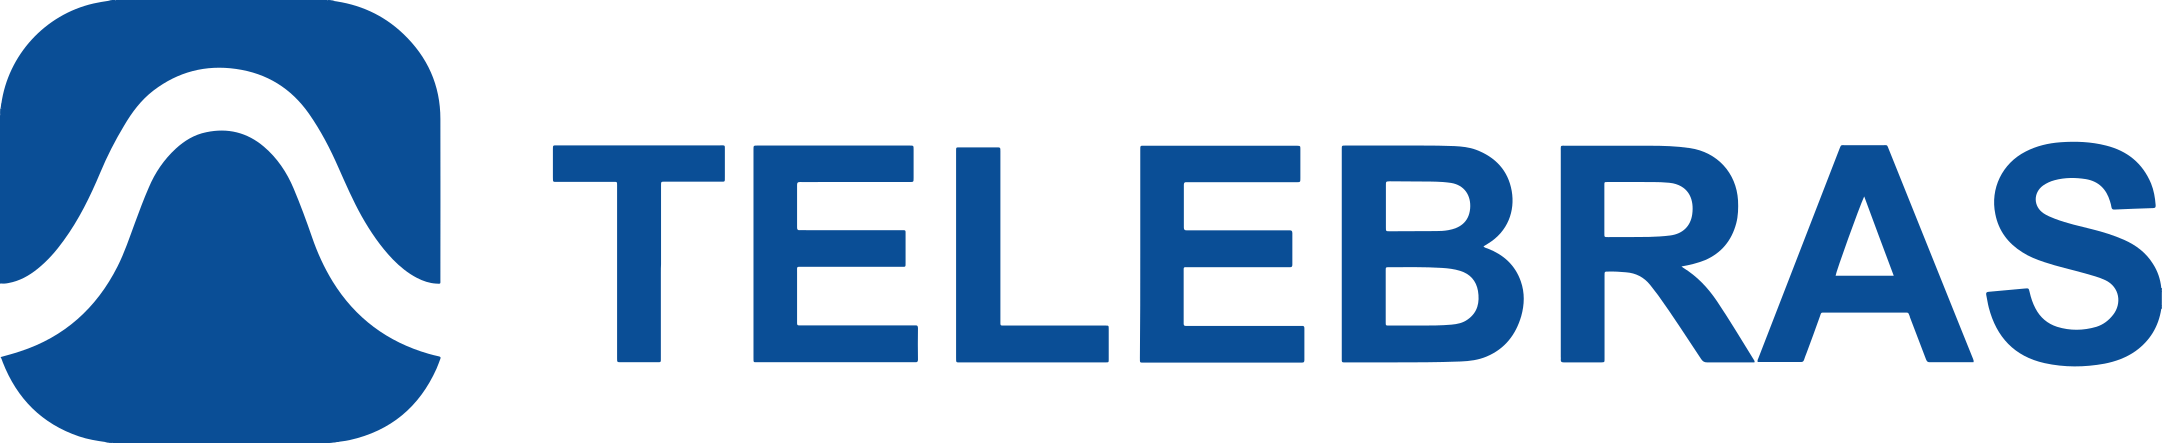 telebras logo 1 - Telebras Logo